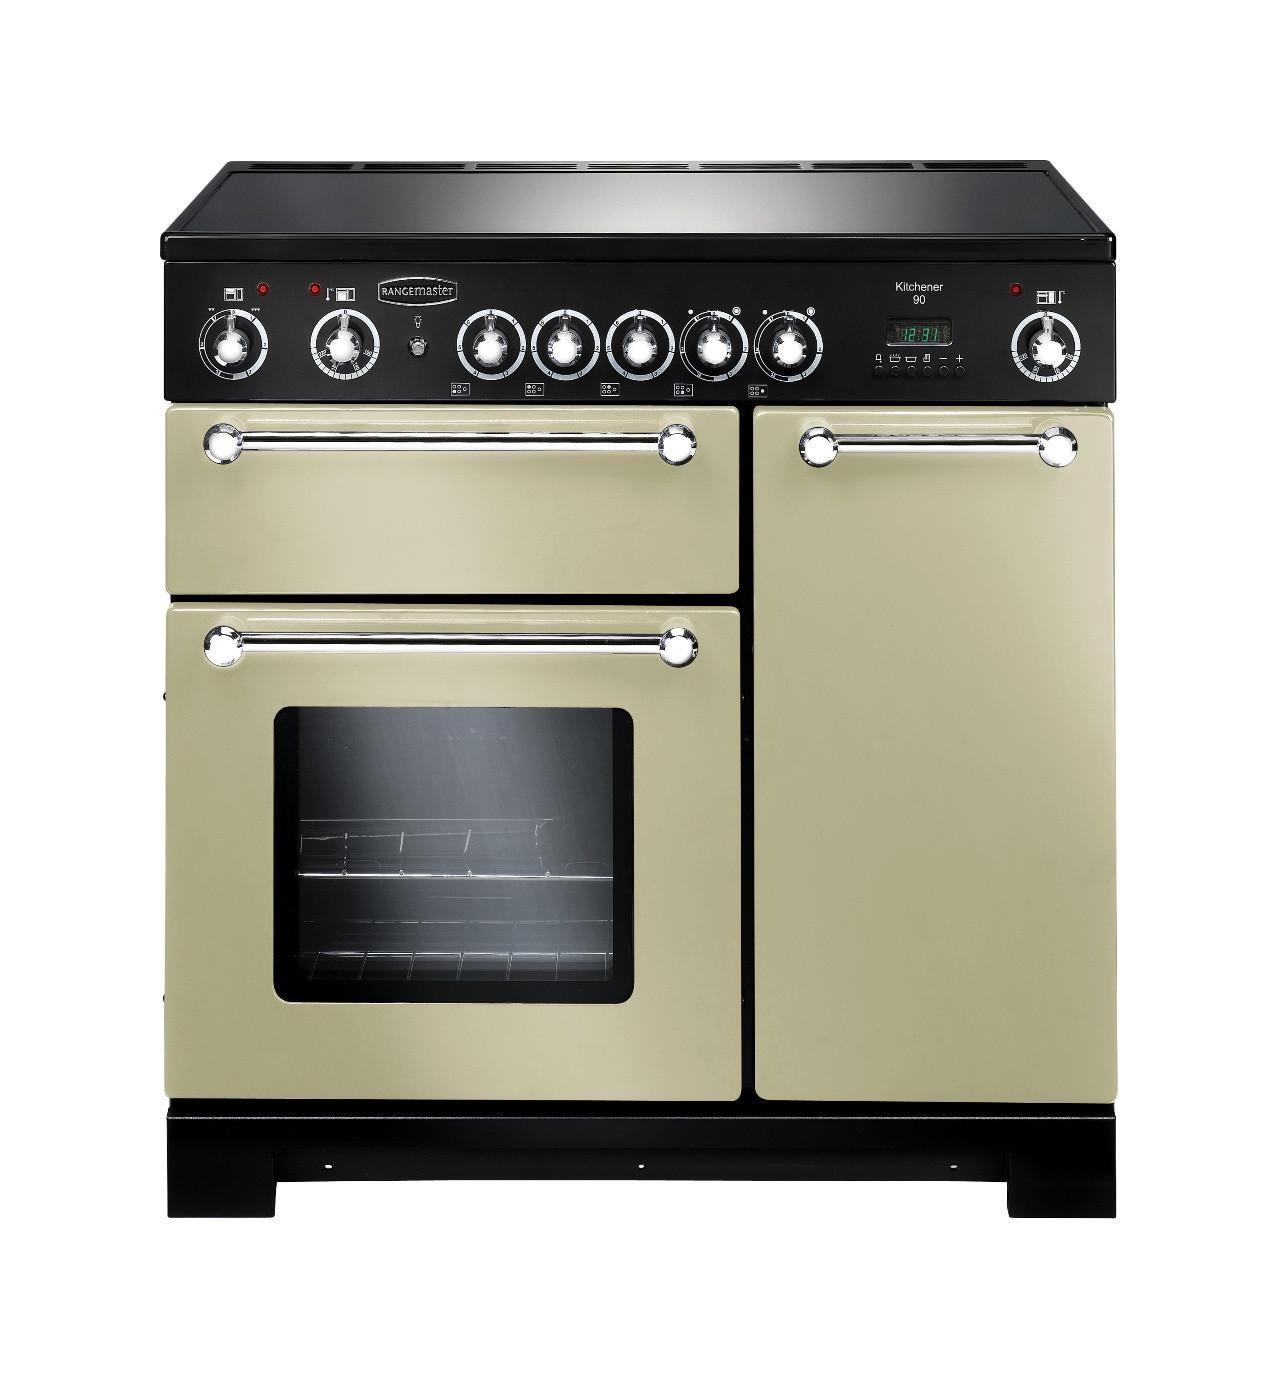 Rangemaster Kitchener 90 Ceramic Cream Range Cooker 79280